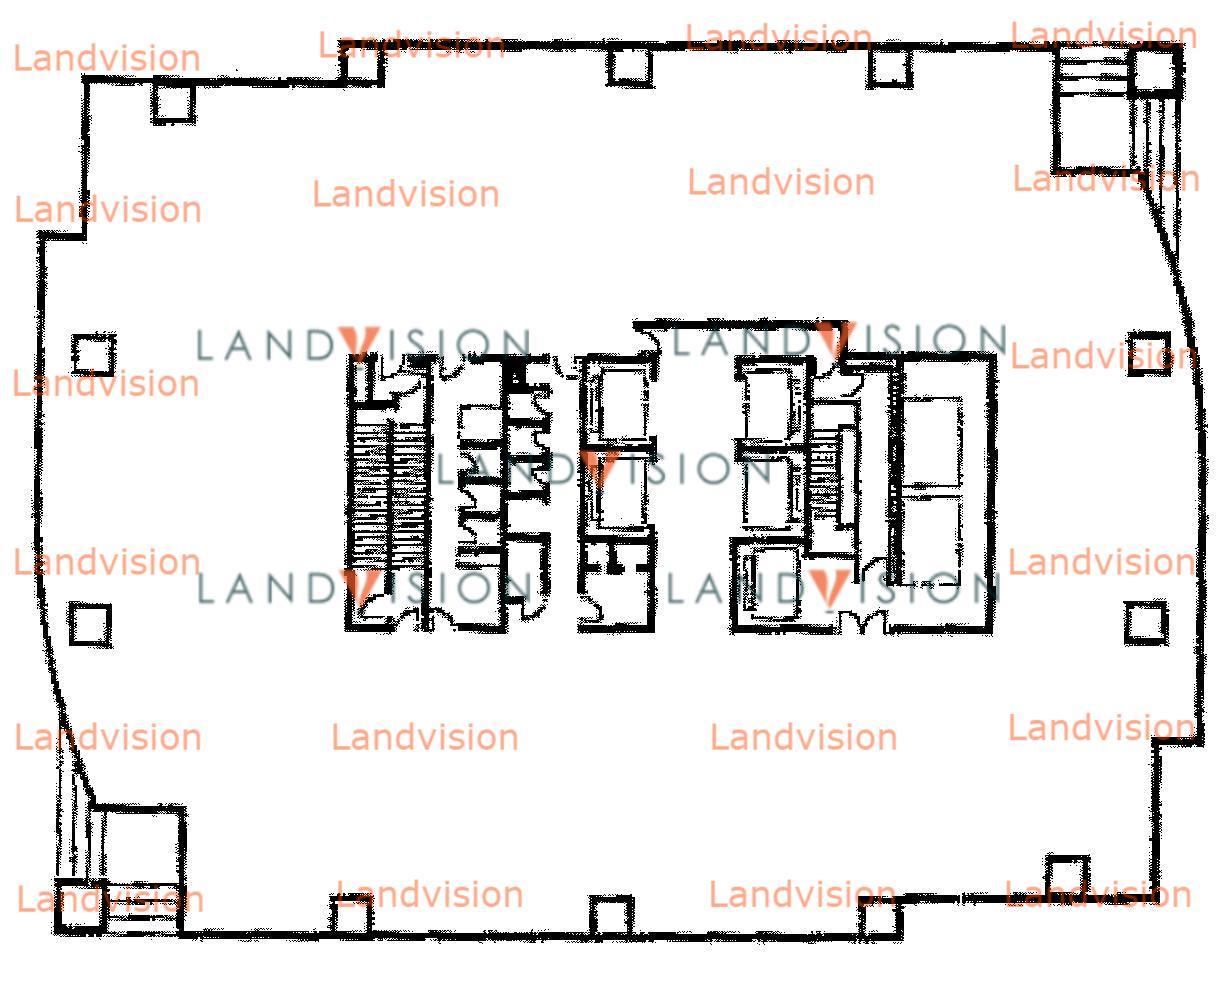 https://www.landvision.com.hk/wp-content/uploads/website/resize/floorplans/000648.JPG